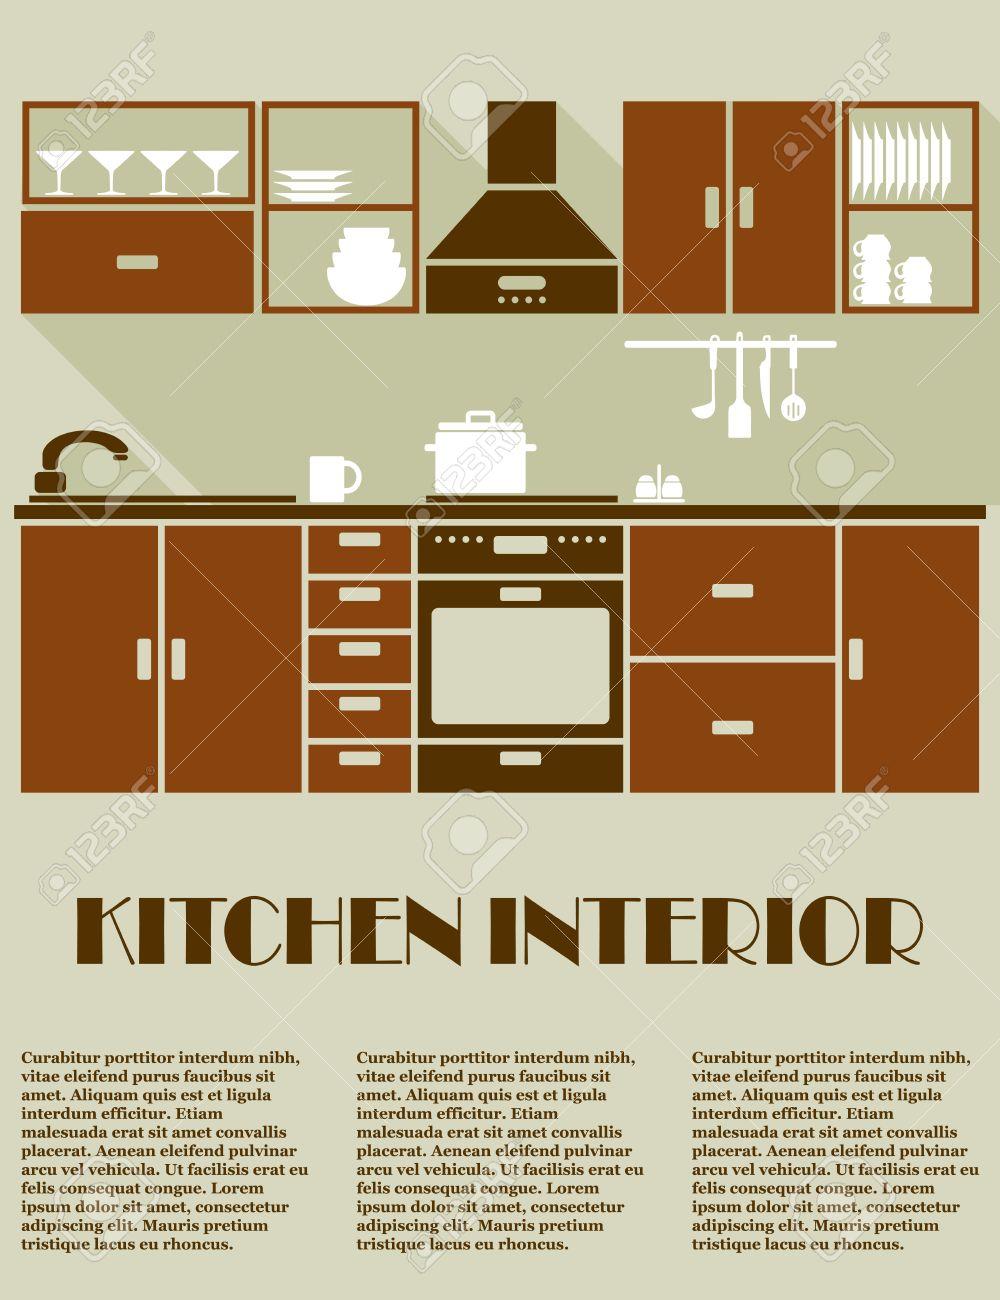 home may modular facebook hannahmodularinc image indoor contain media and kitchen hannah cabinets id cabinet